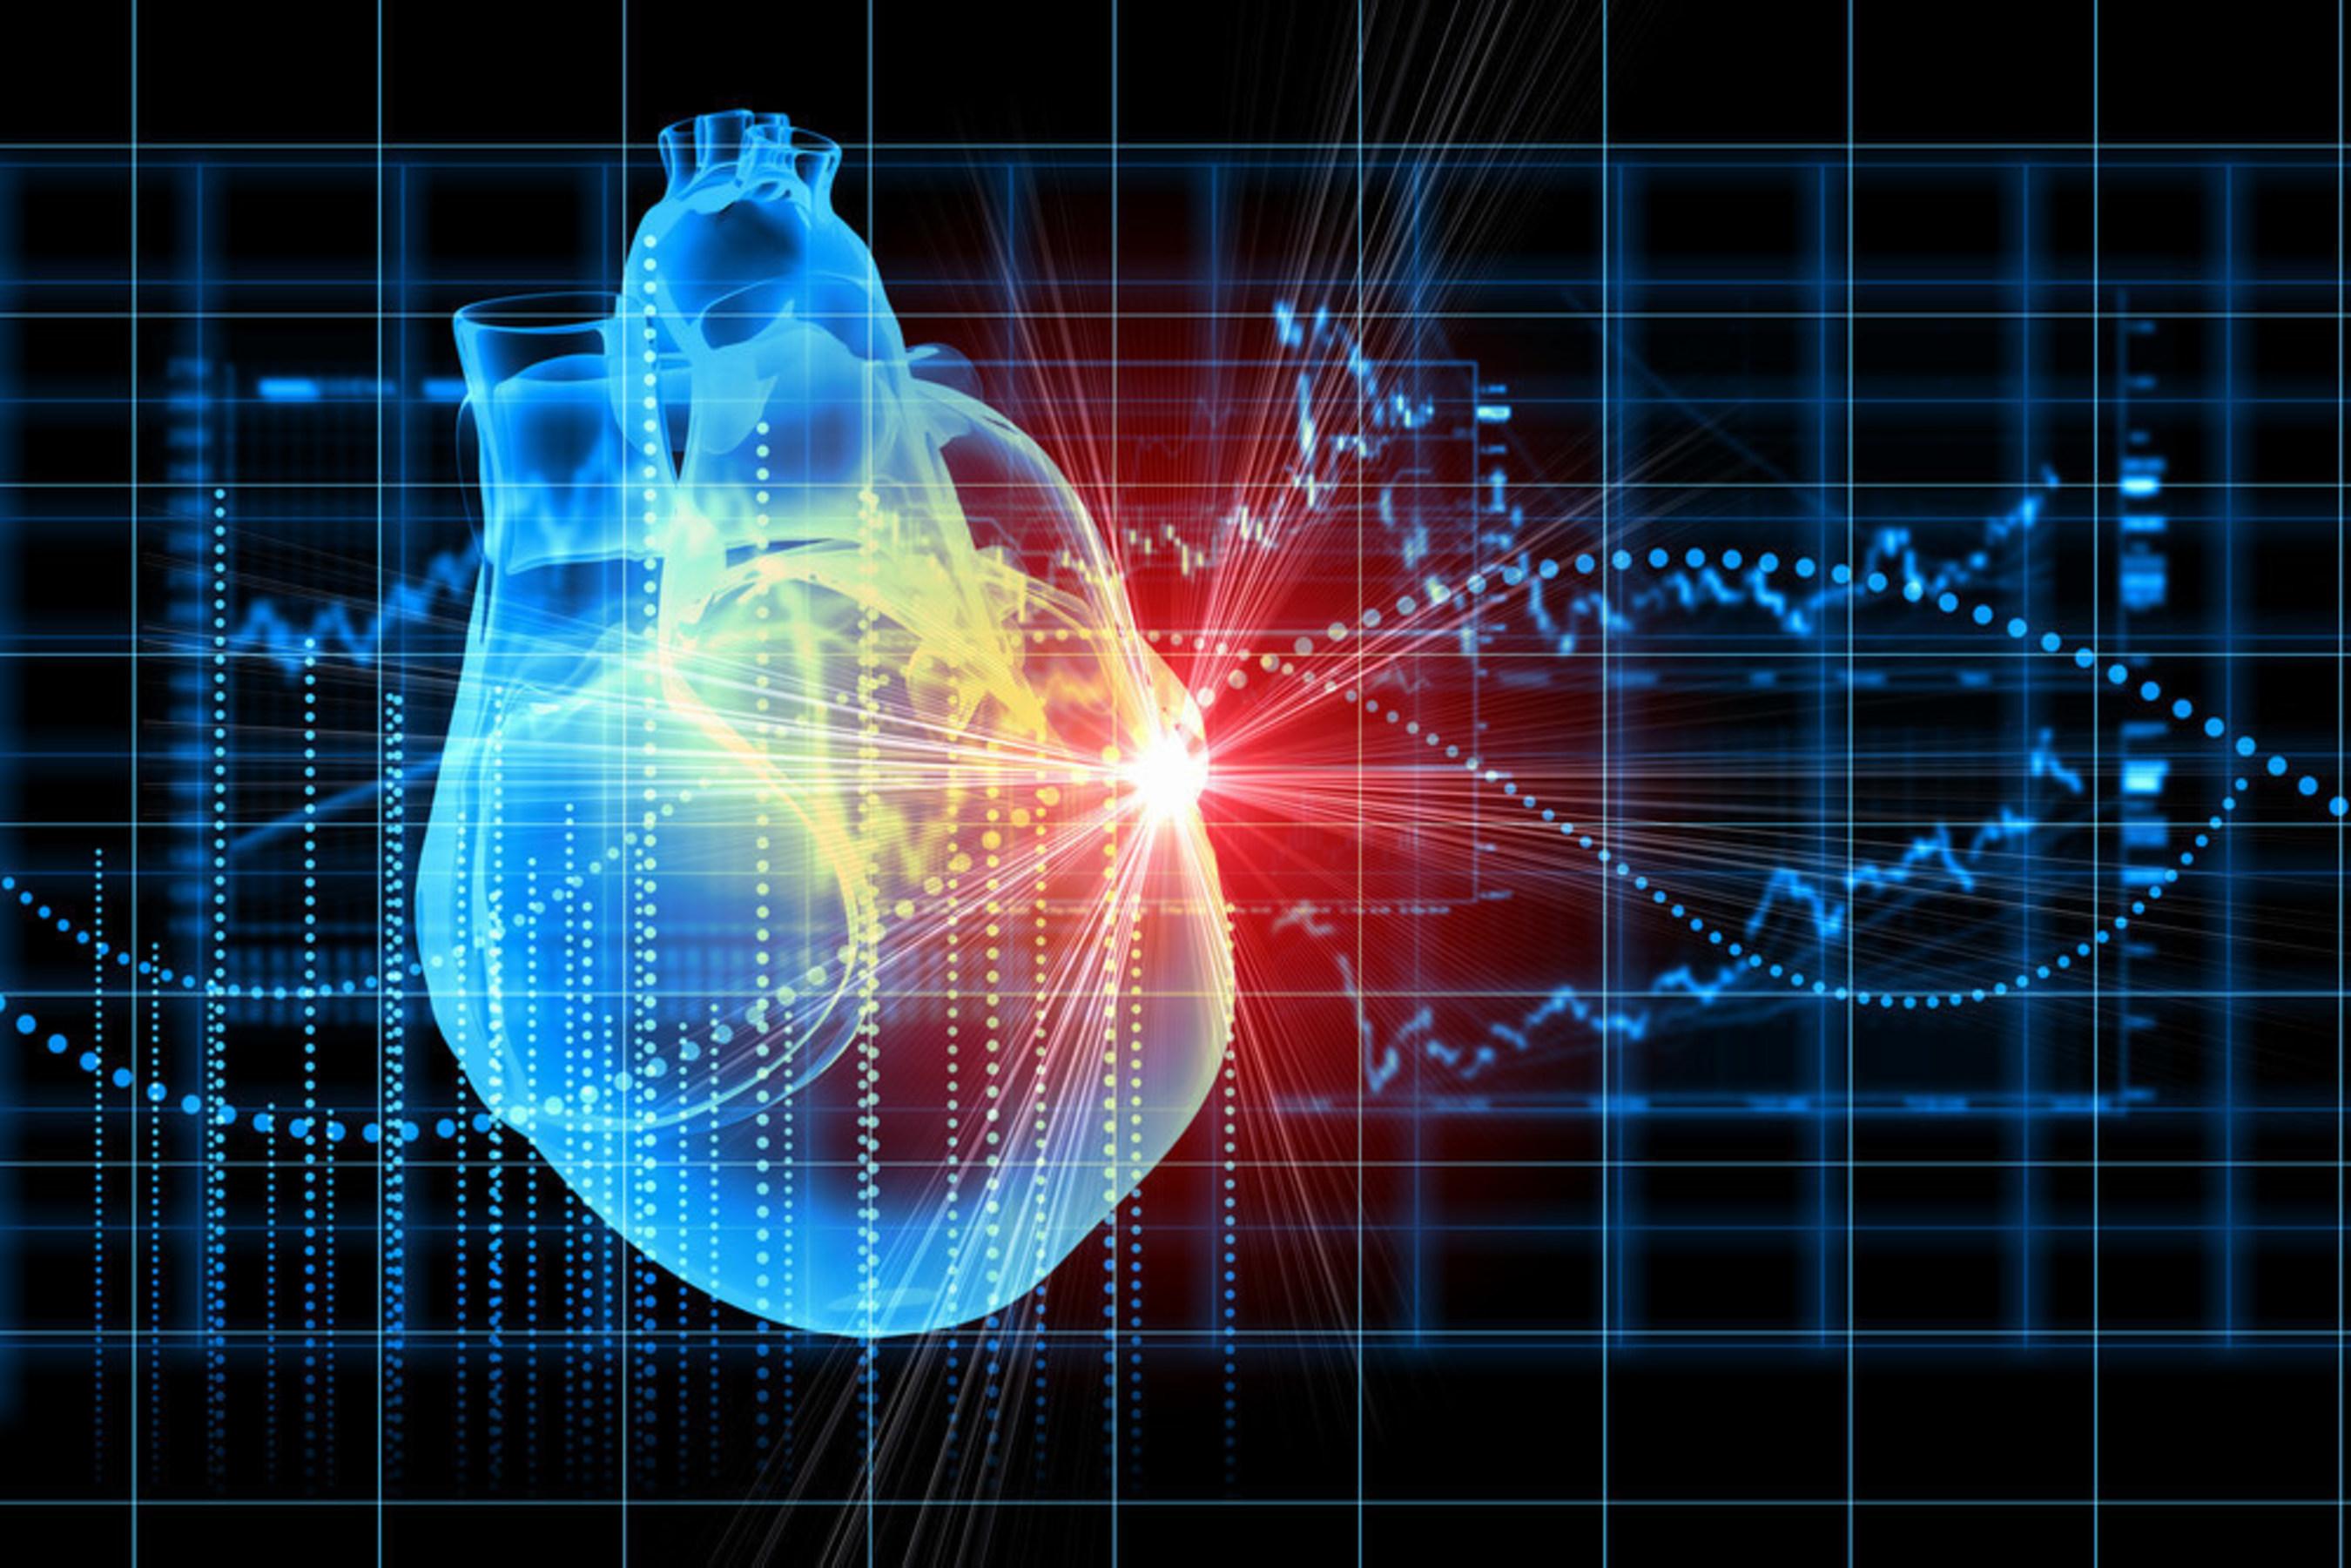 CardioNXT drives innovation in understanding and treatment of cardiac arrhythmias such as AFib.